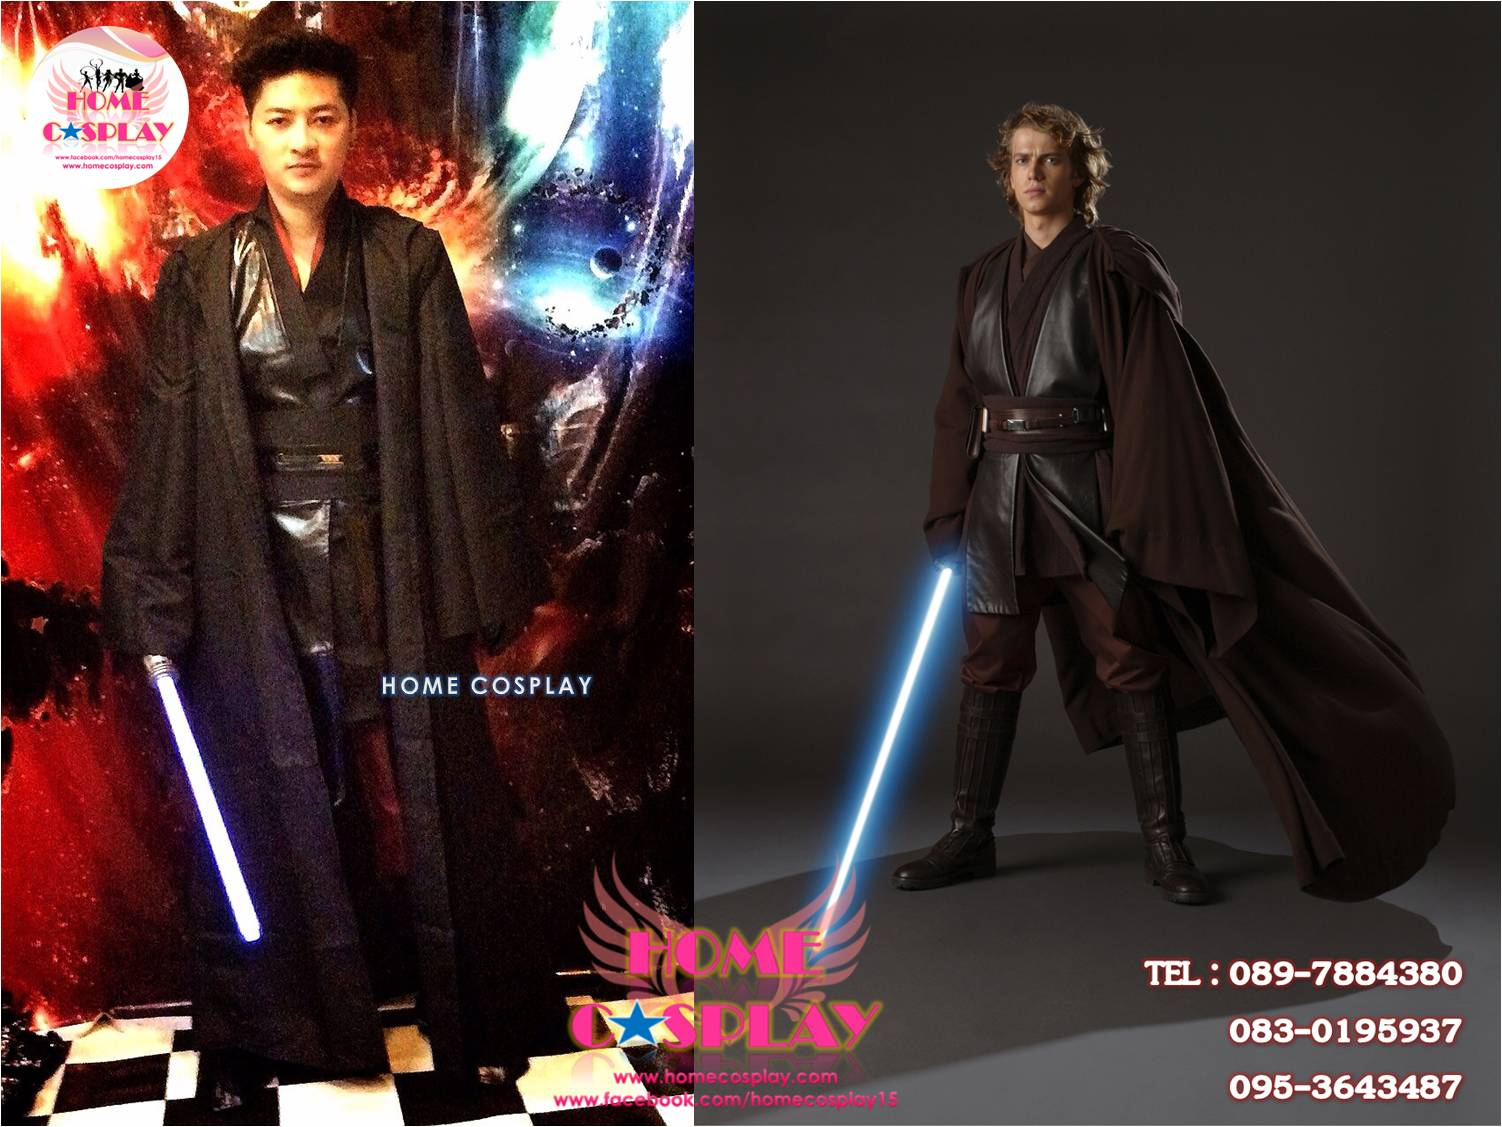 Premium Set: ชุดอัศวินเจได อนาคิน สกายวอล์คเกอร์ Jedi Anakin Skywalker - Star Wars